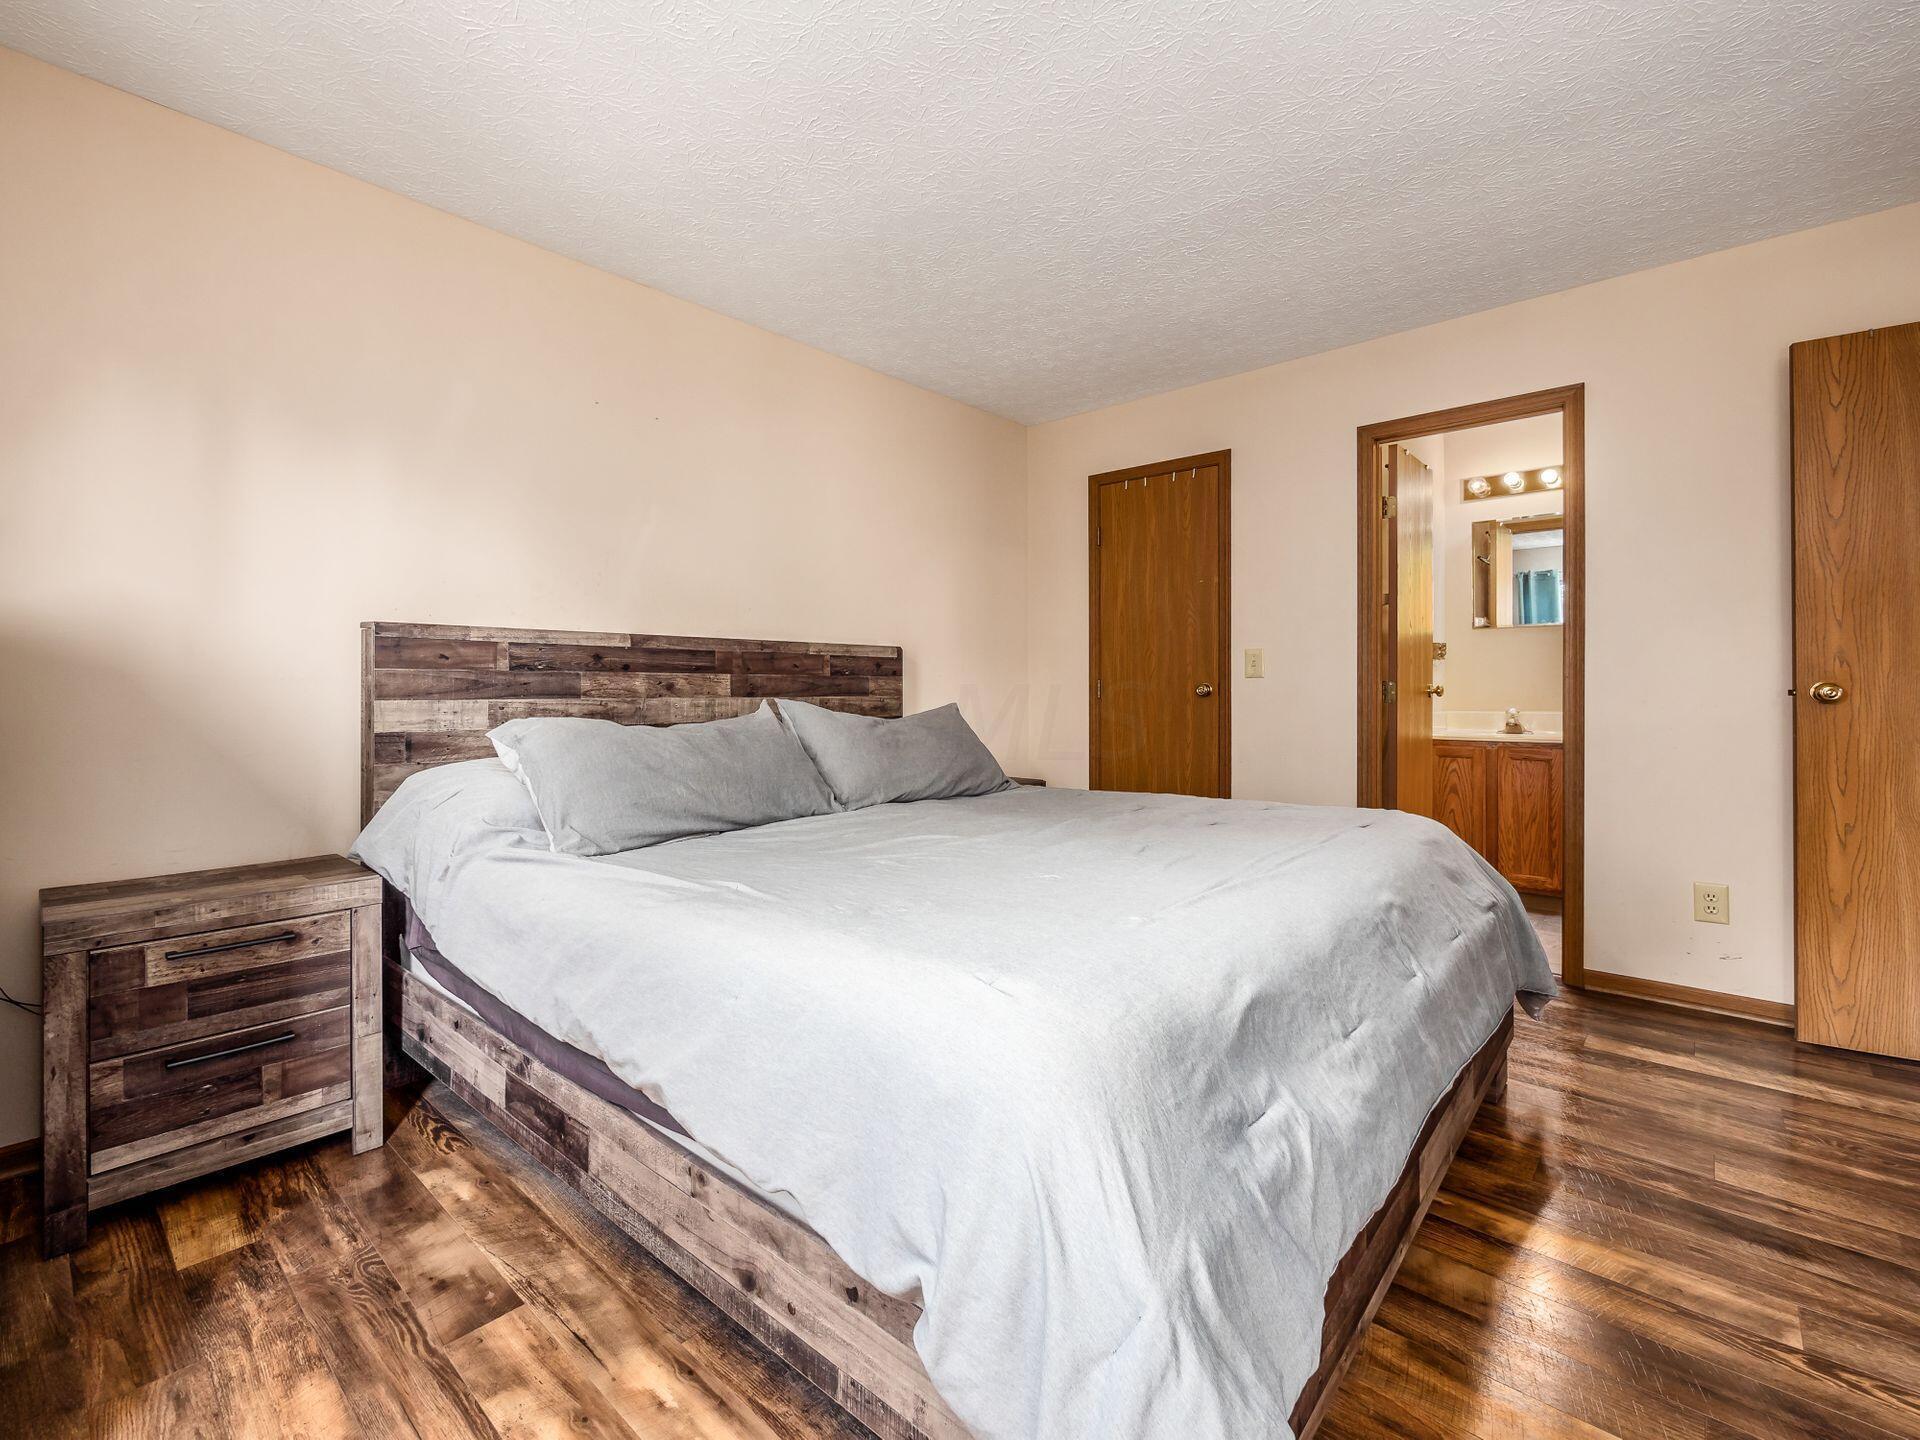 walk-in closet & full bath en suite